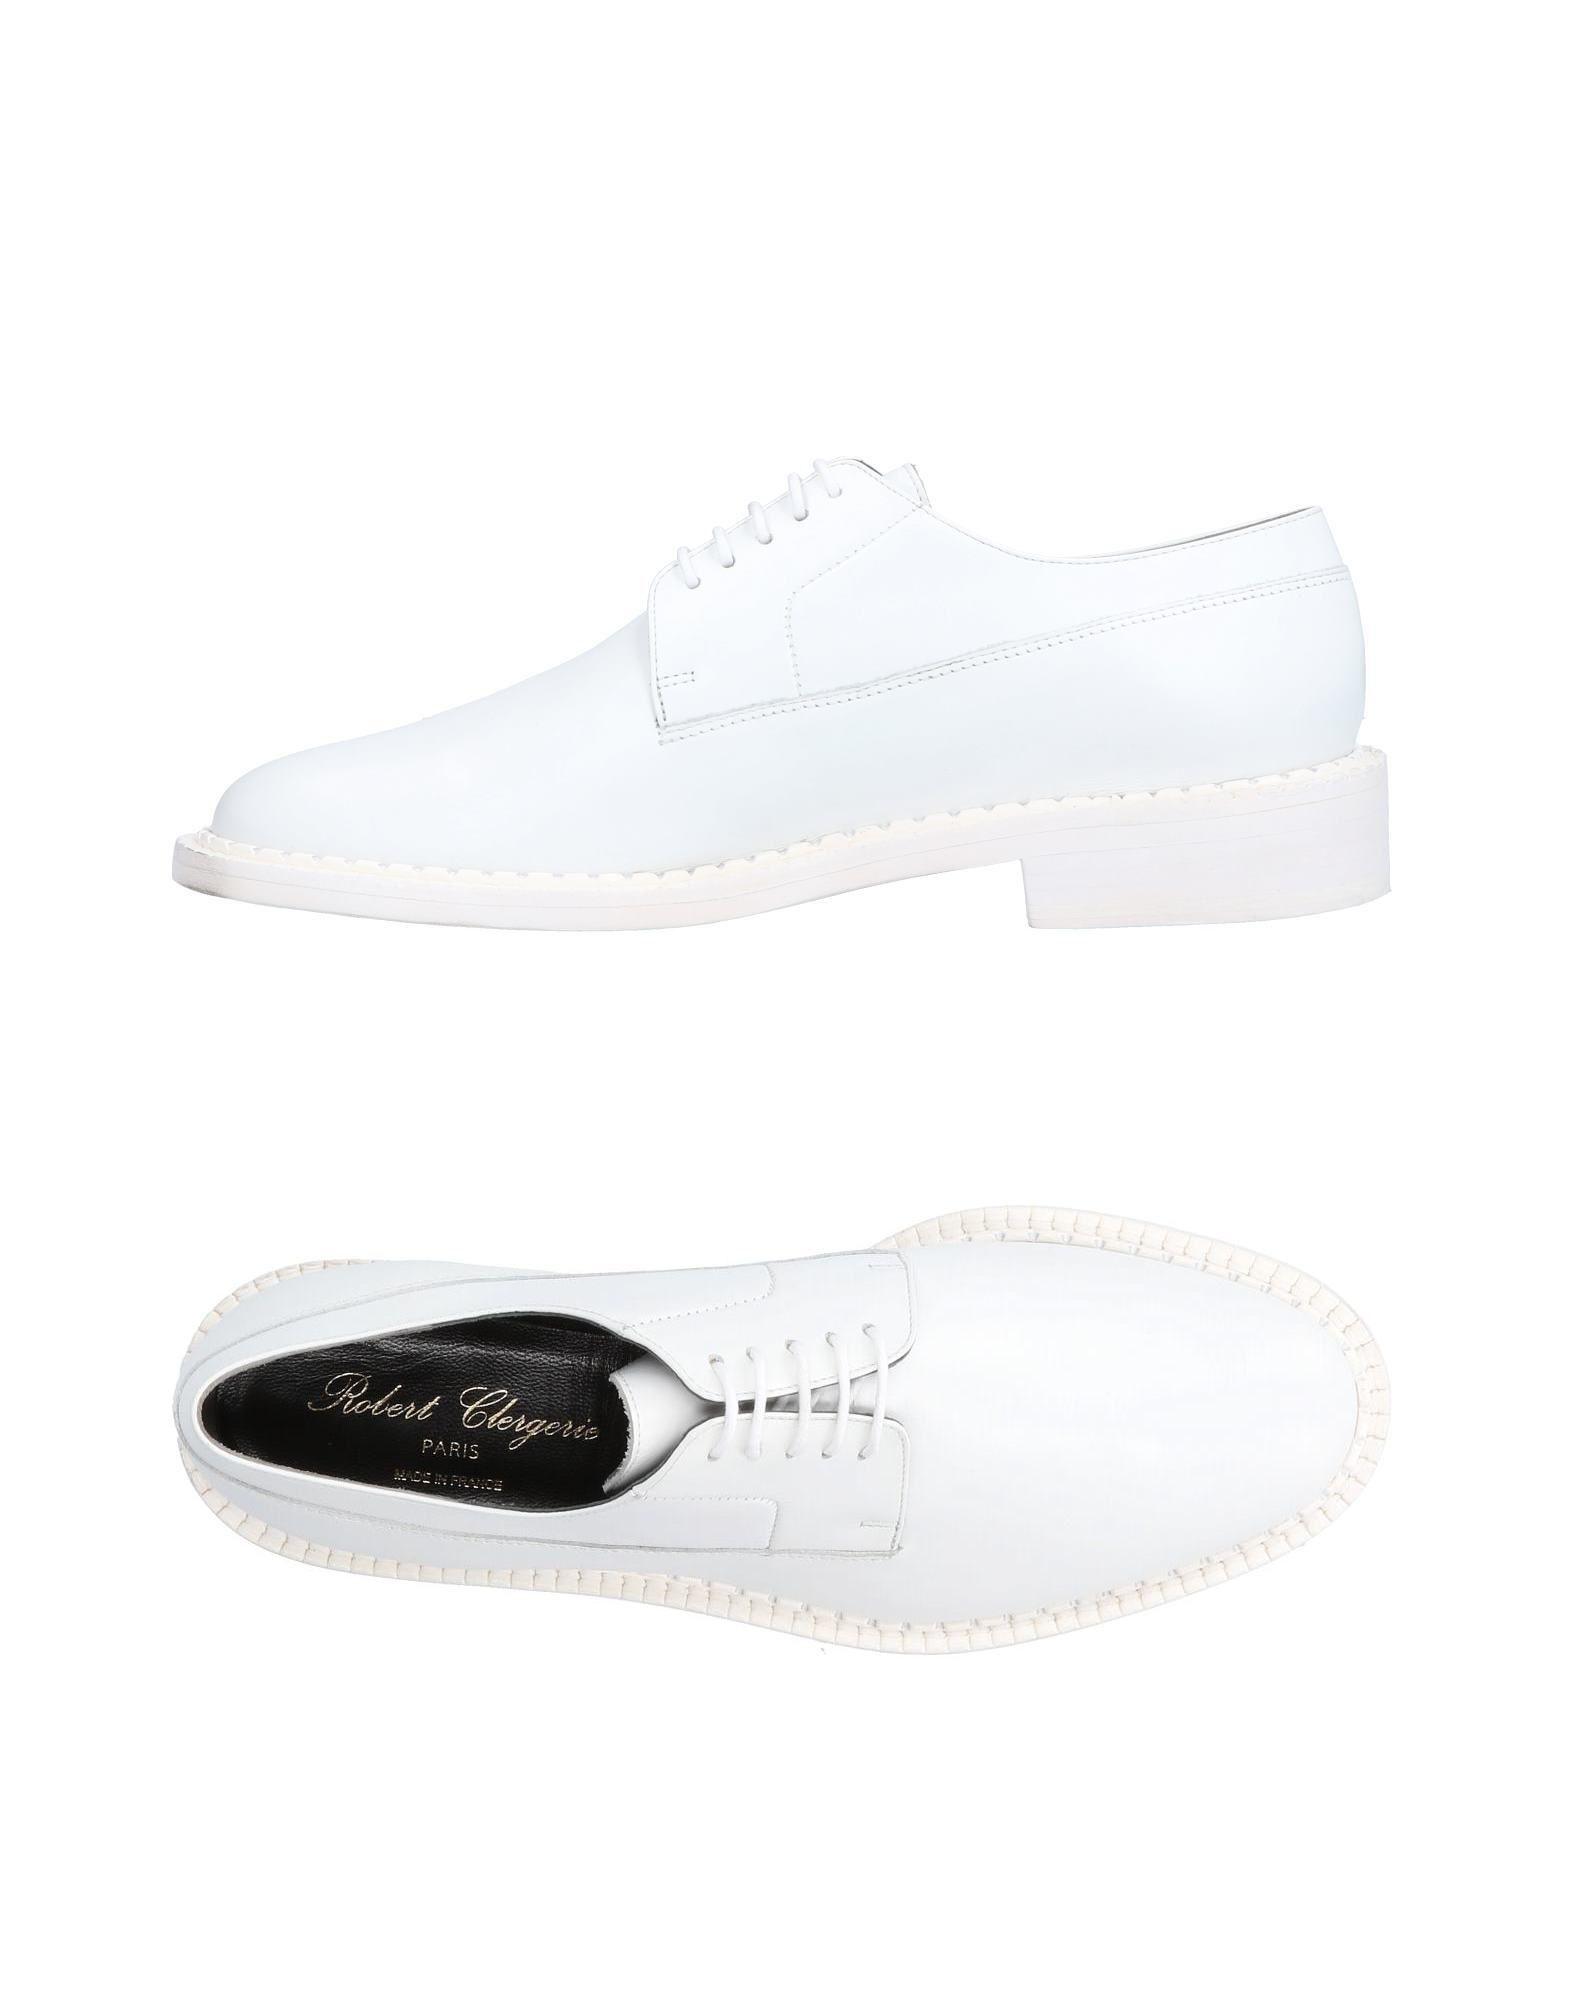 ROBERT CLERGERIE Обувь на шнурках robert clergerie сапоги